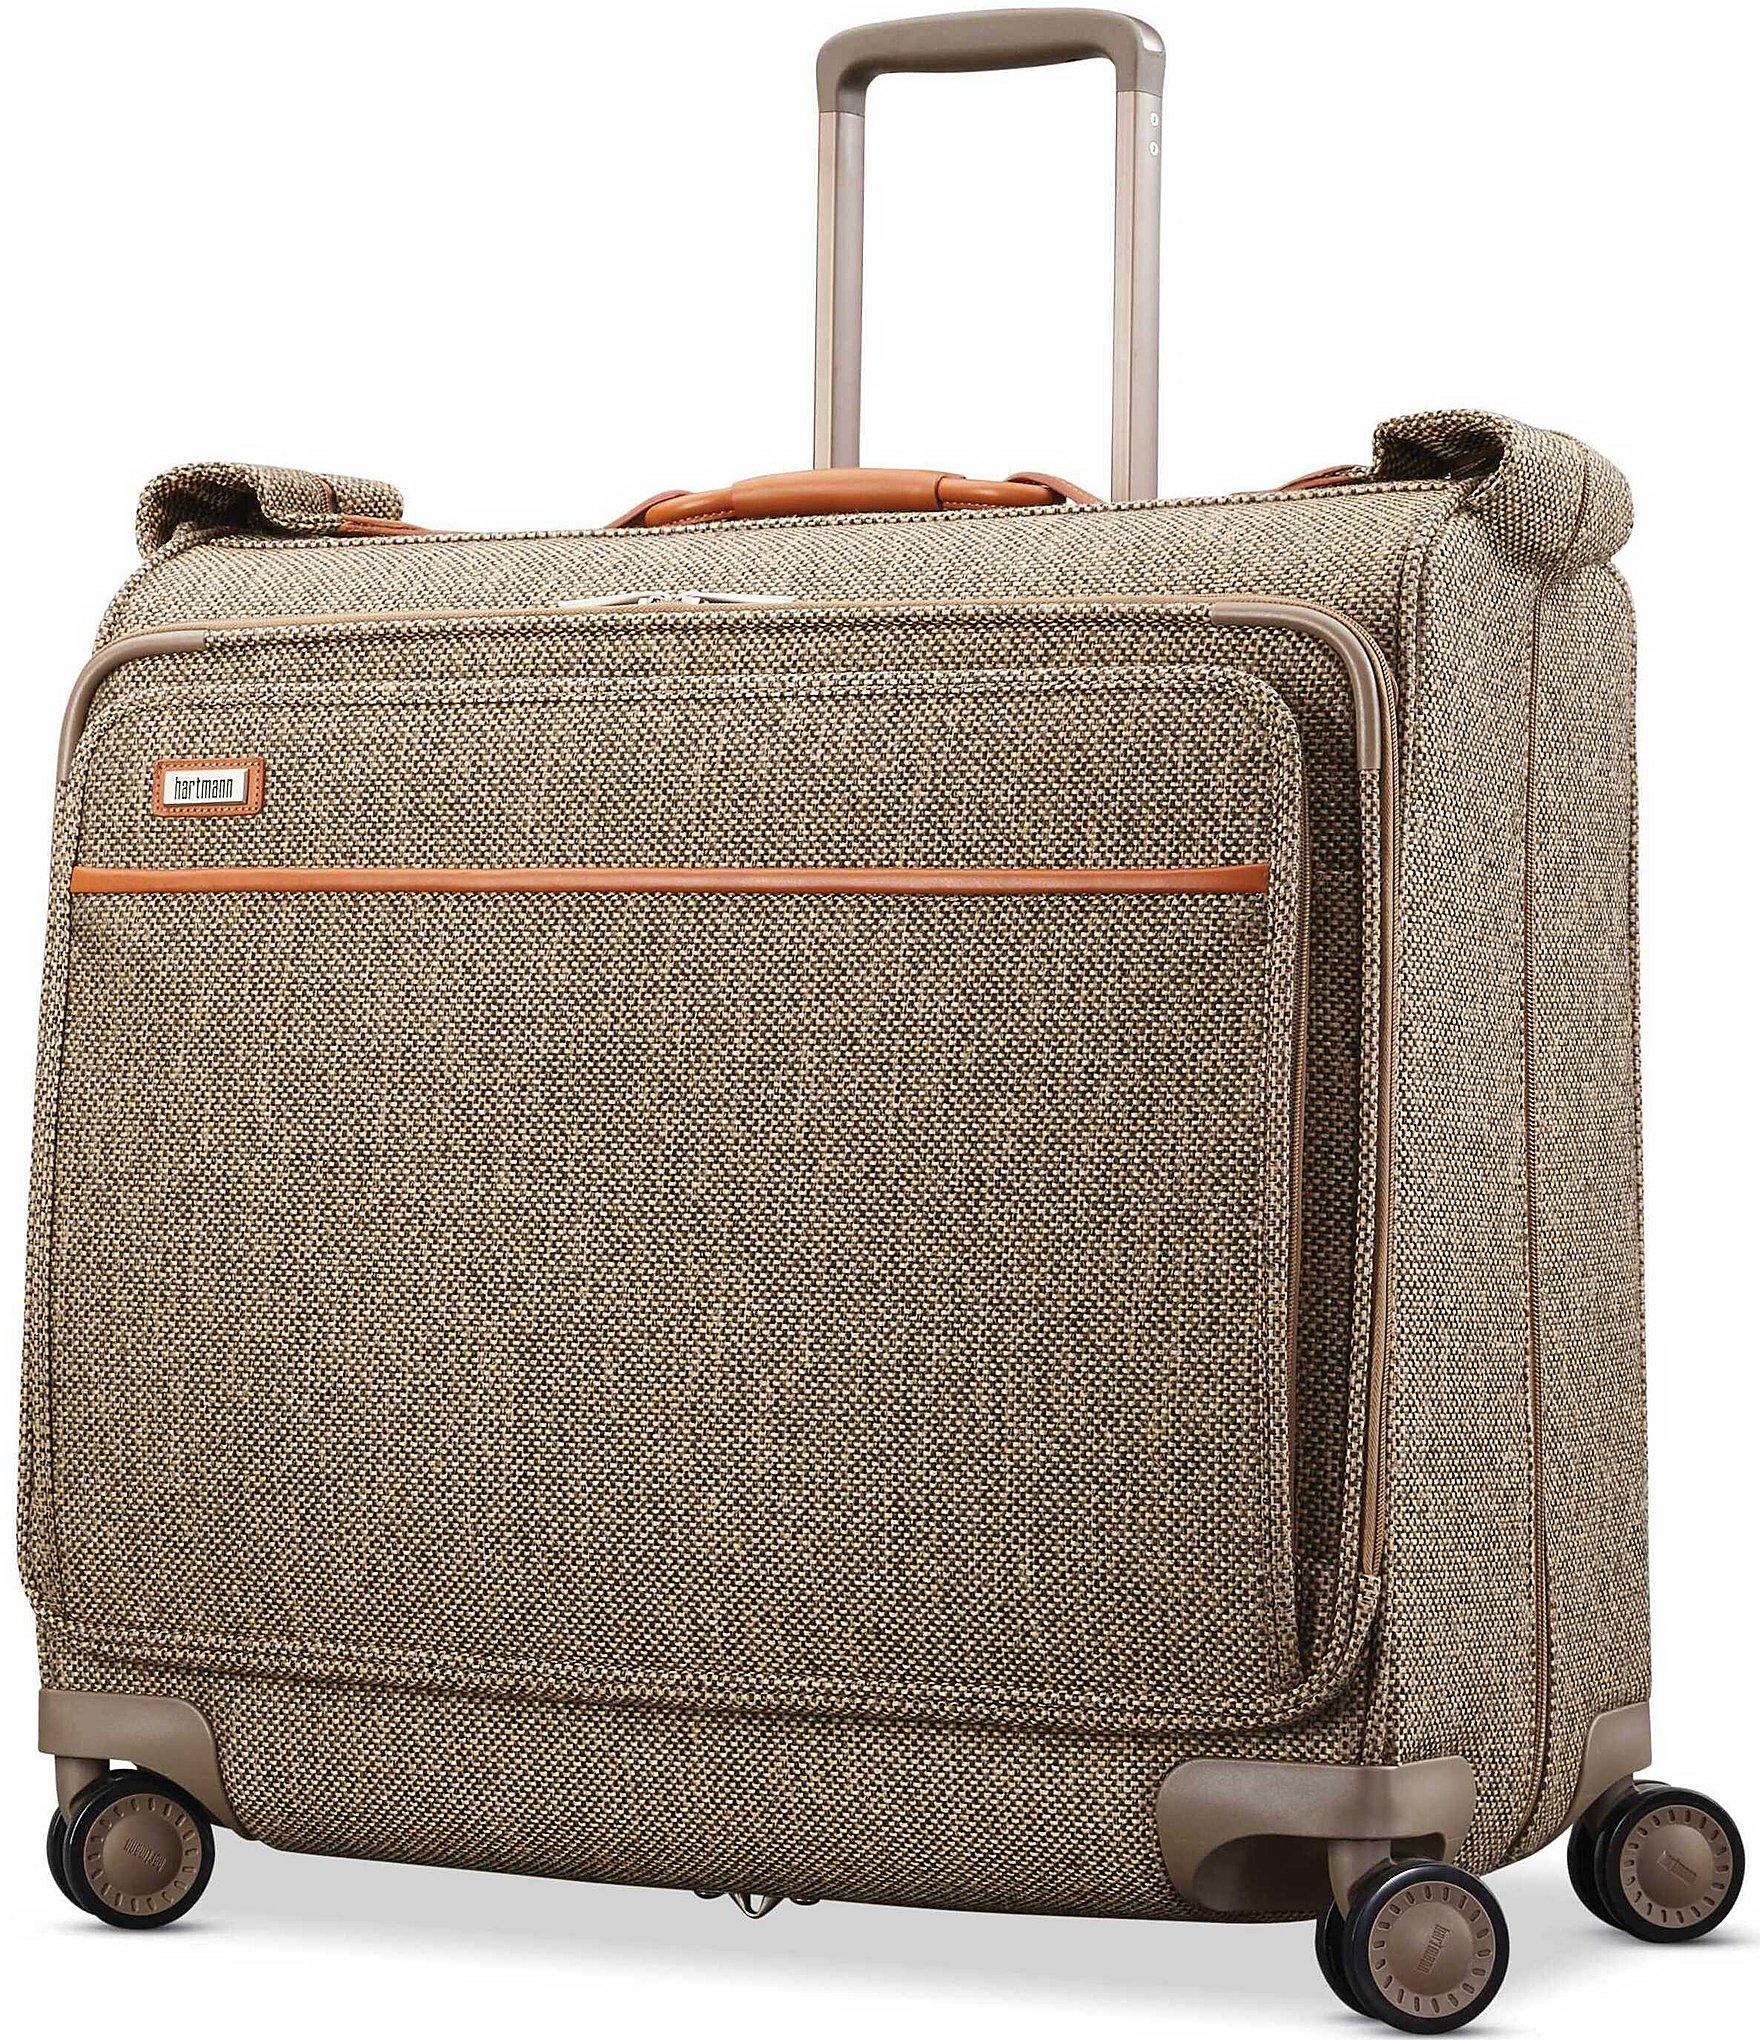 0ea5f511b2 Hartmann Luggage   Travel Accessories